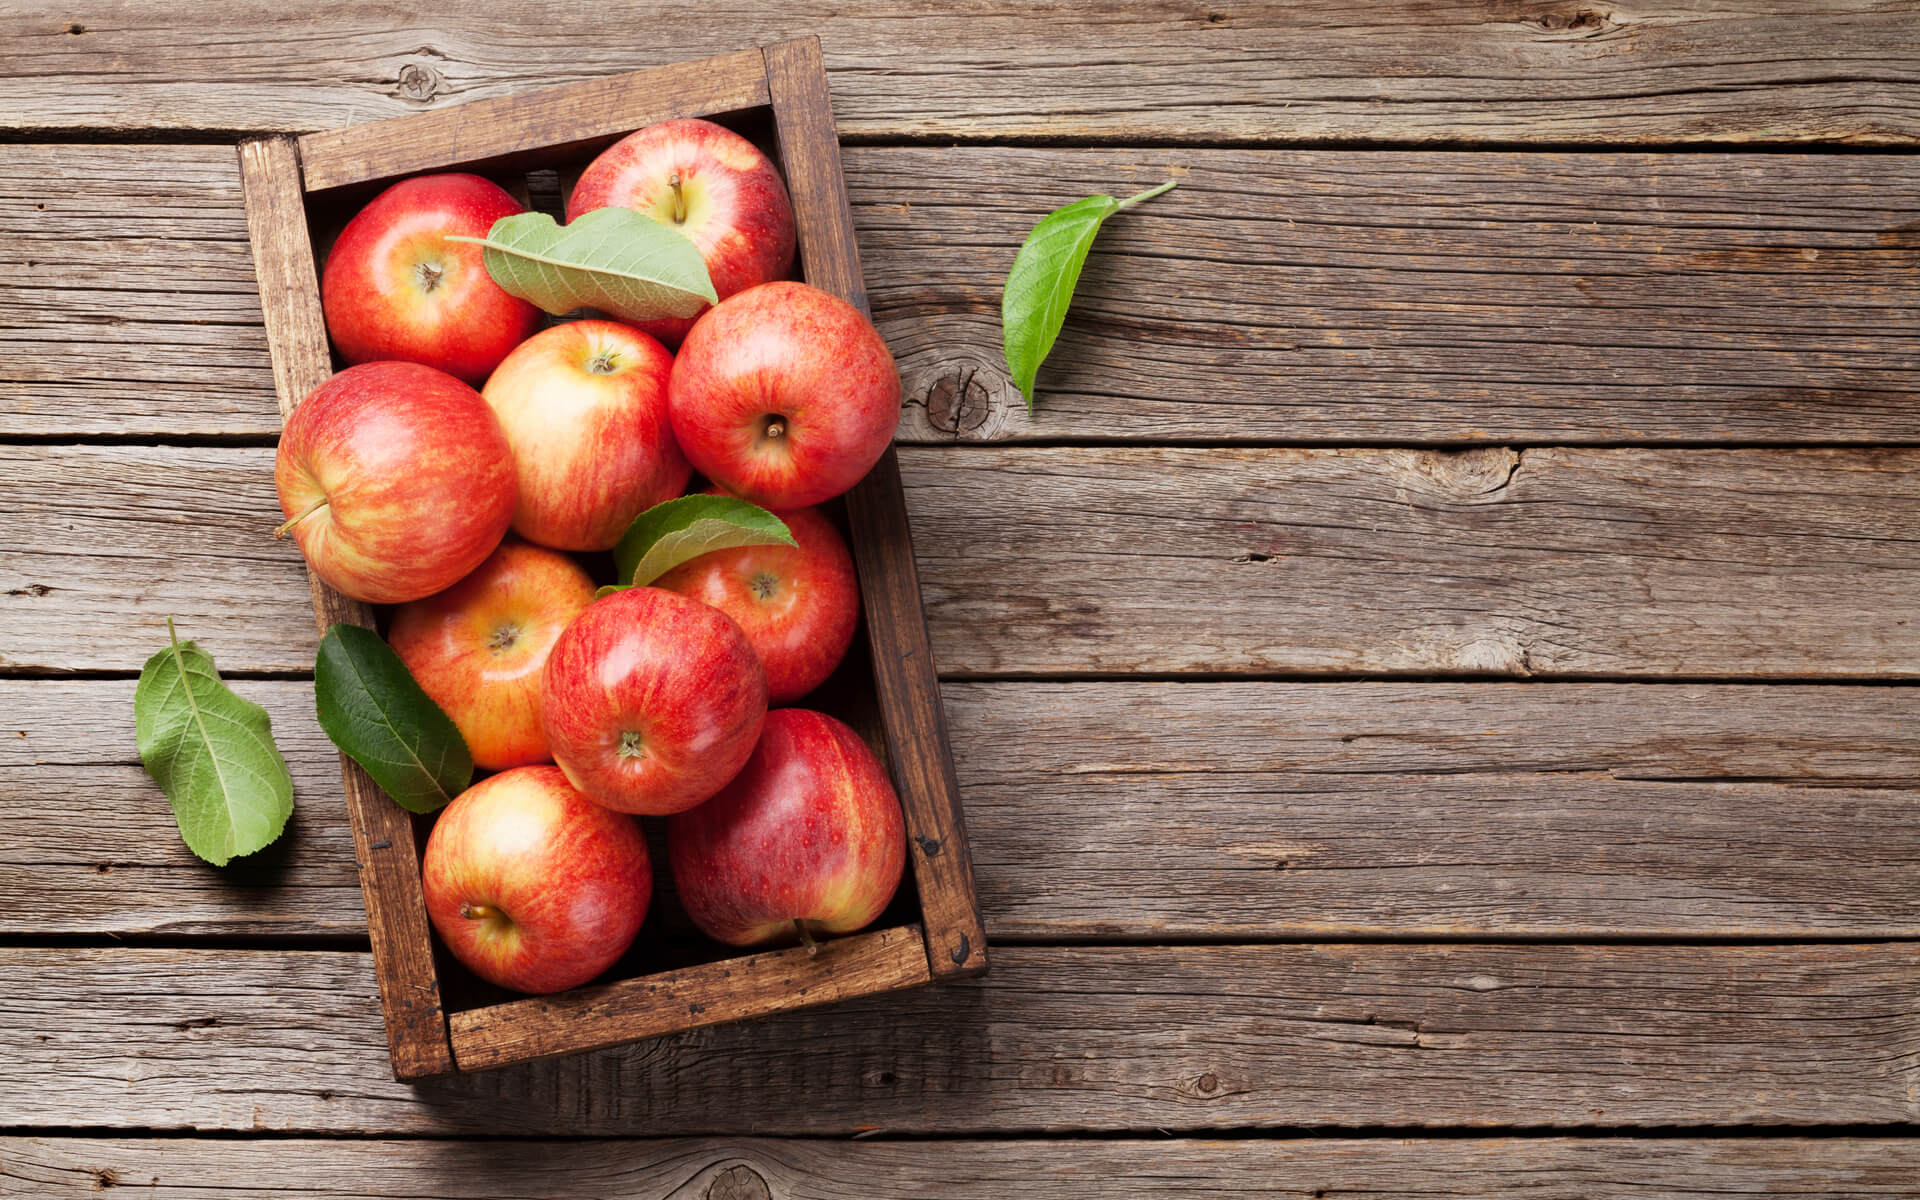 bg-apples-tasty-healty-w1920h1200